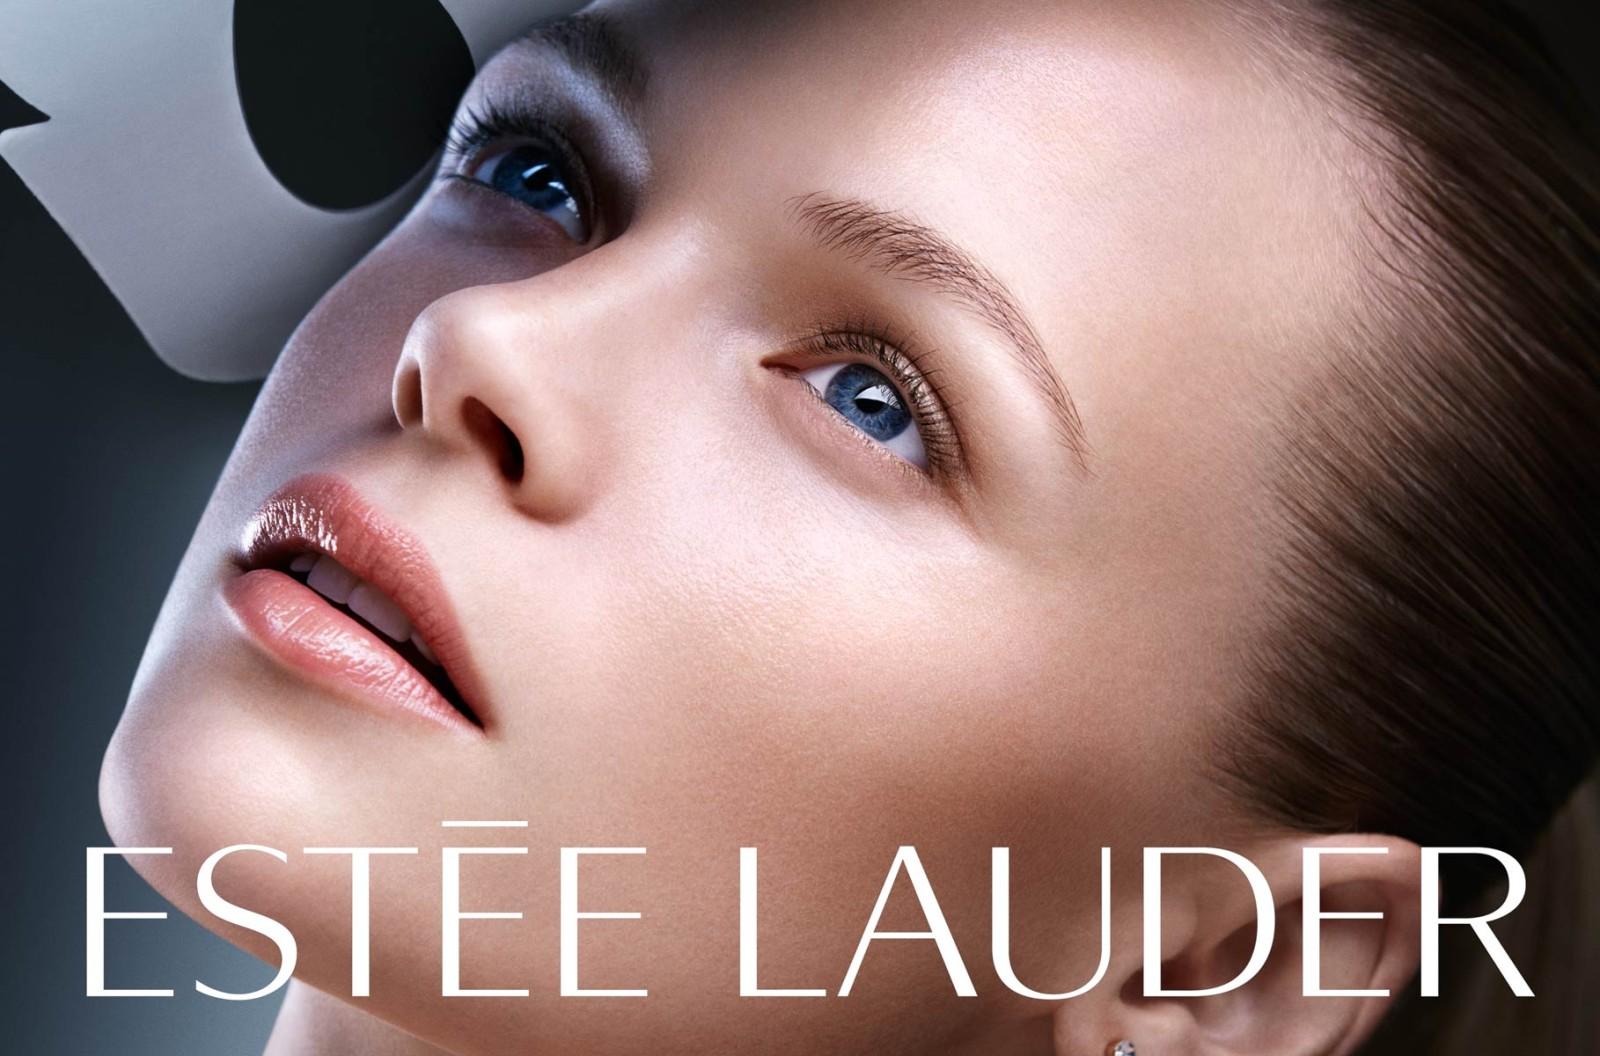 kem mắt Estee Lauder review